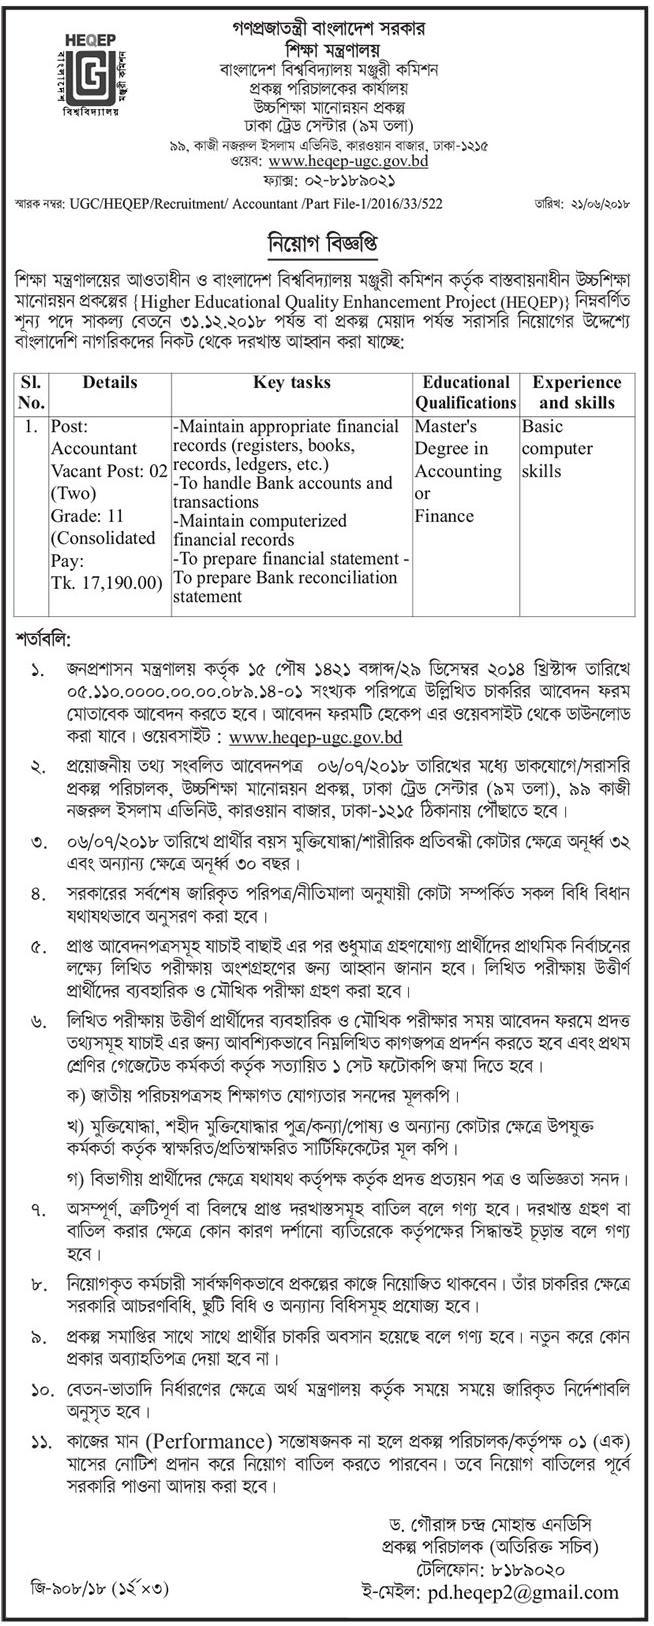 Ministry Education jobs Circular apply